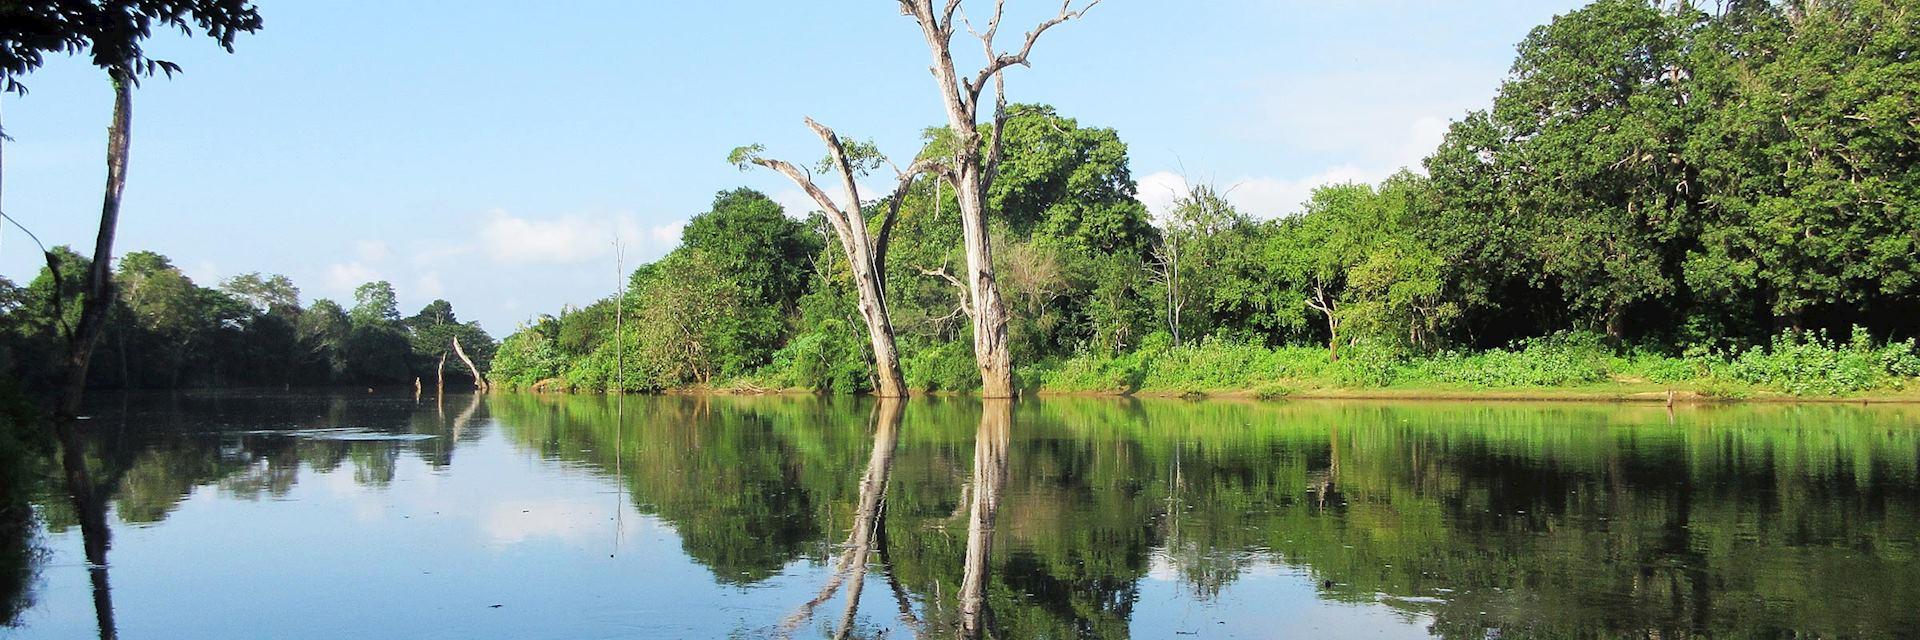 River in Uda Walawe National Park